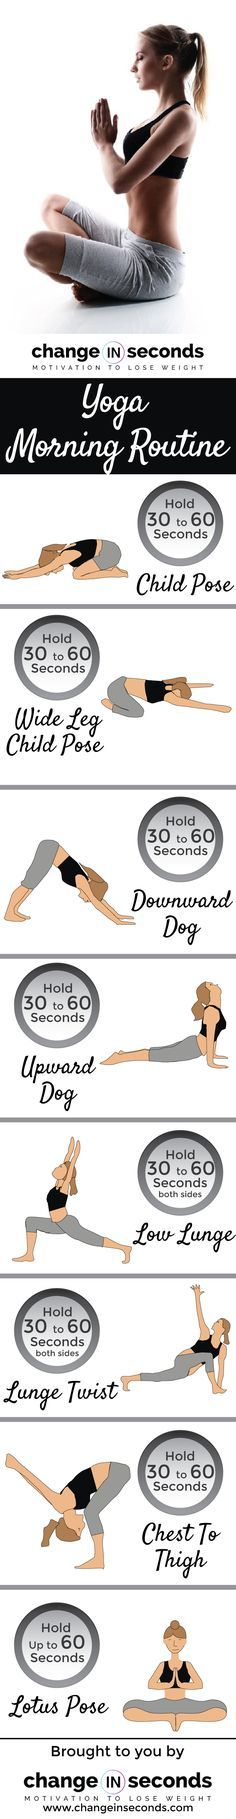 Yoga Morning Routine (Download PDF) https://www.changeinseconds.com/yoga-morning-routine/